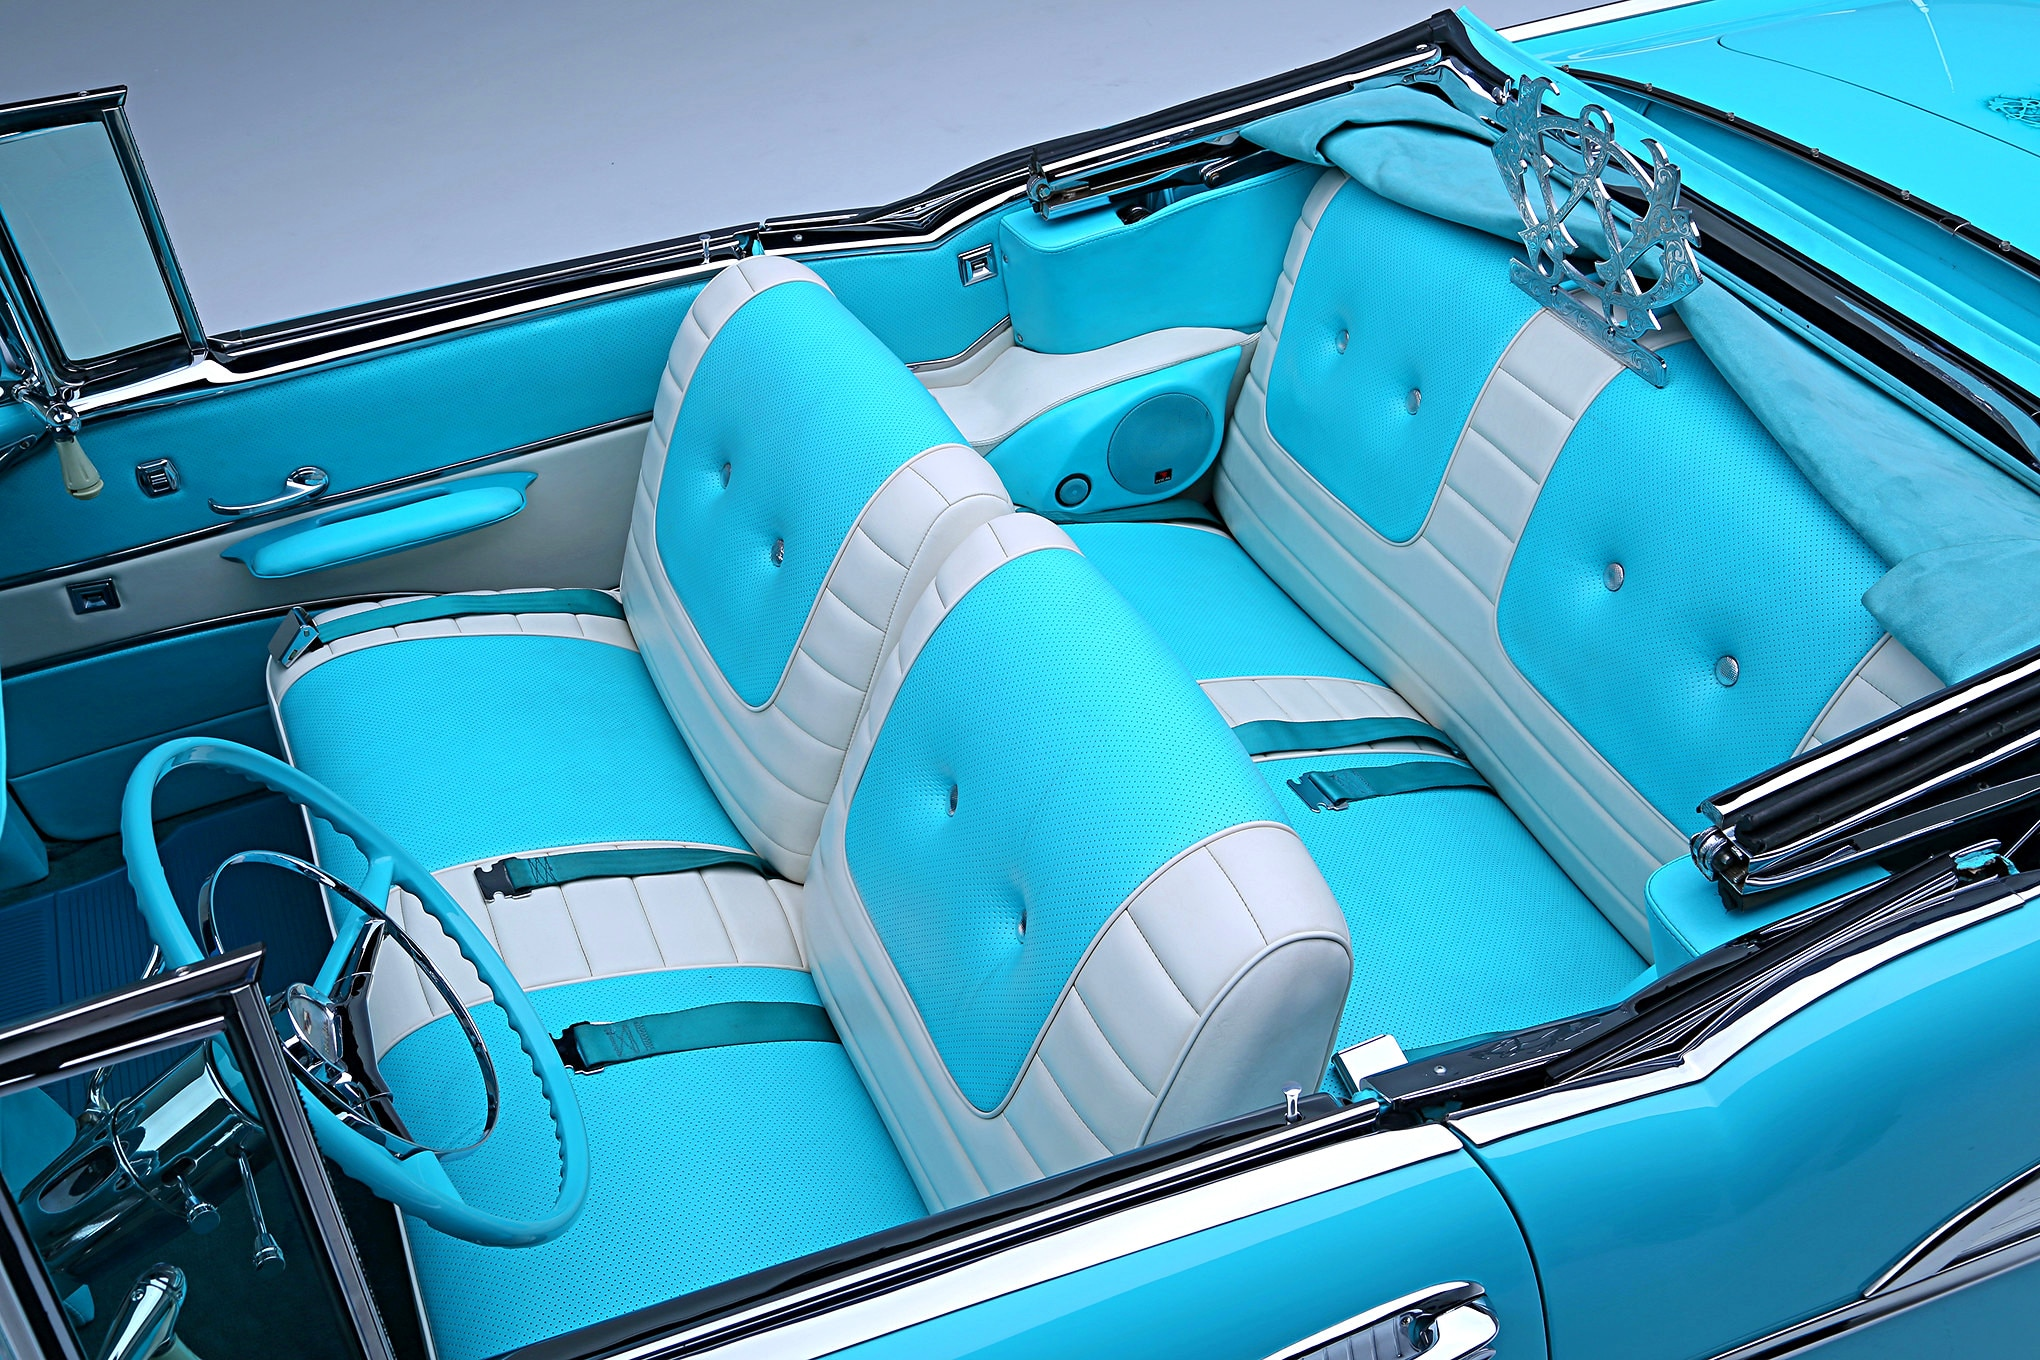 1957 Chevrolet Bel Air White Turquoise Interior Lowrider